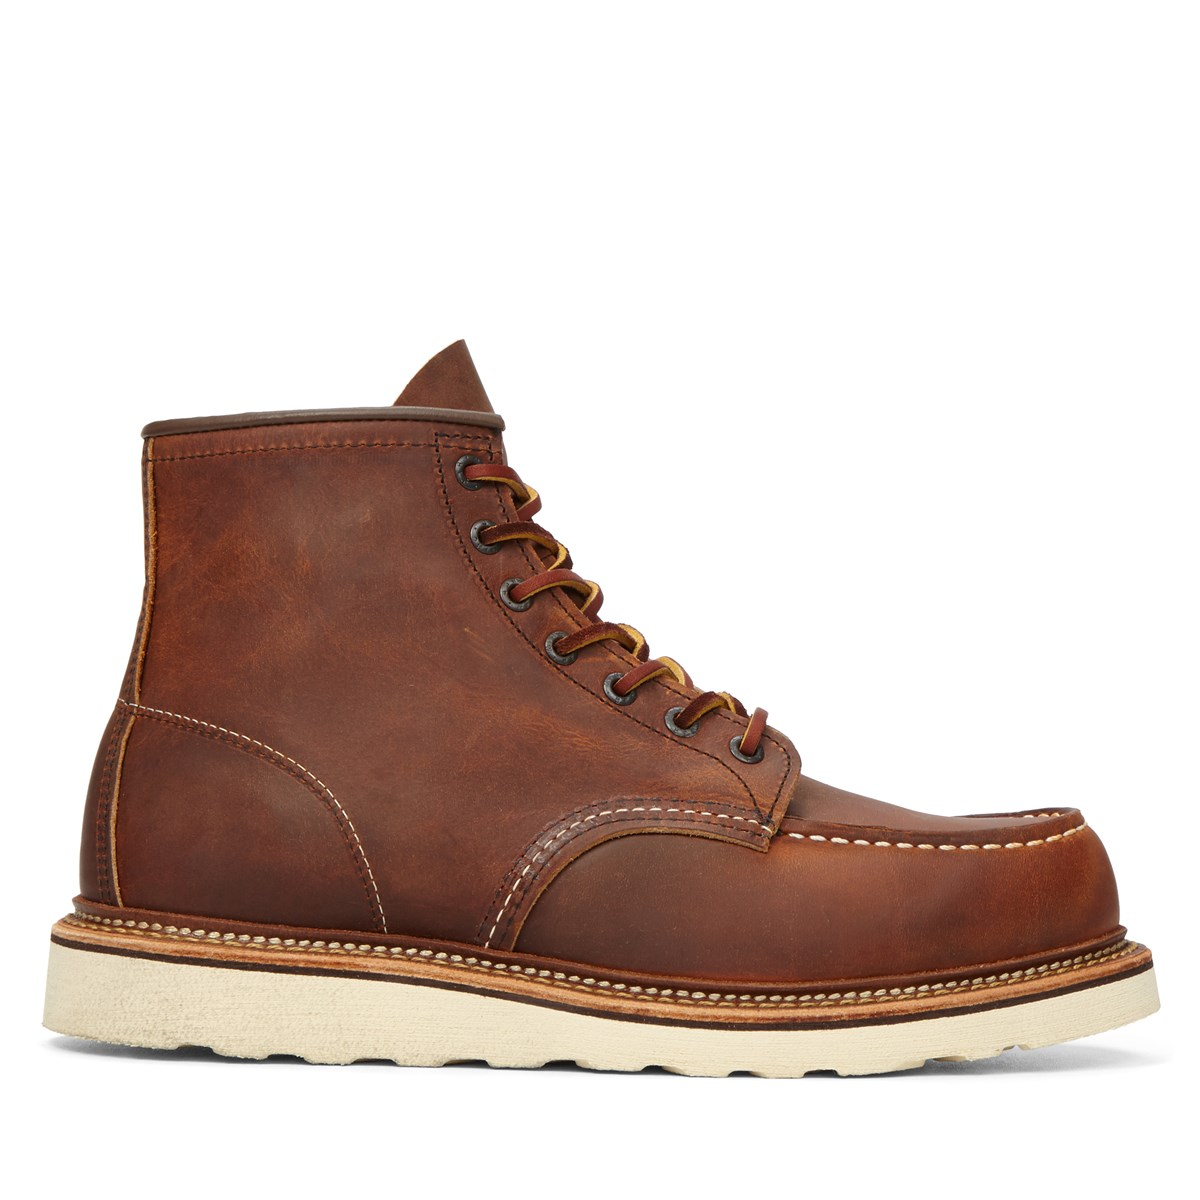 s moc toe 1907 classic leather boots burgundy